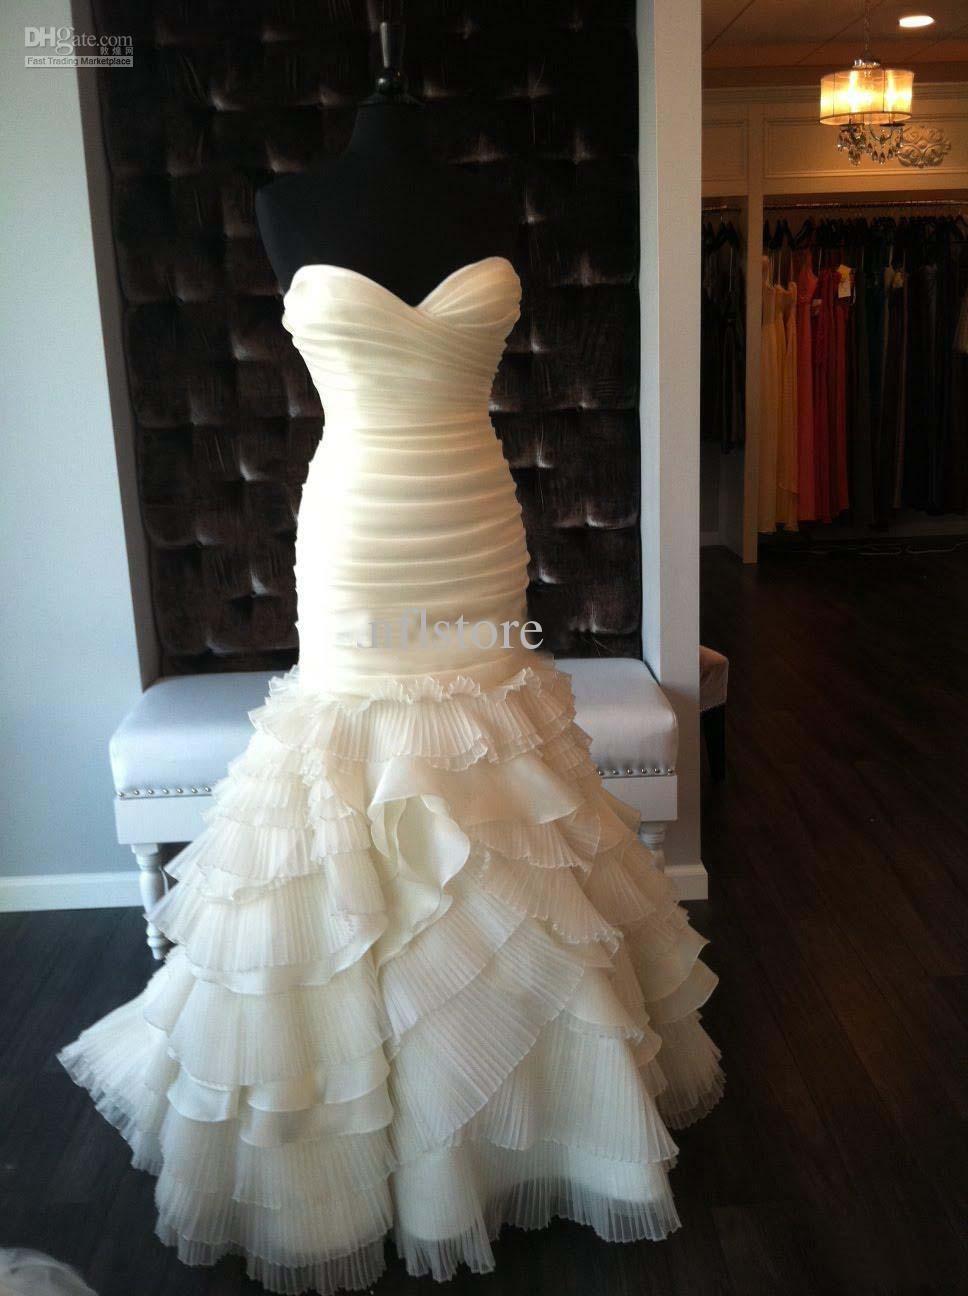 Cheap Strapless Ruffled Organza Mermaid Wedding Dress Pleated Zipper Chapel Train Bridal Gown From Nflstore 155 48 Dhgate Com Wedding Dresses Mermaid Wedding Dress Dresses [ 1296 x 968 Pixel ]